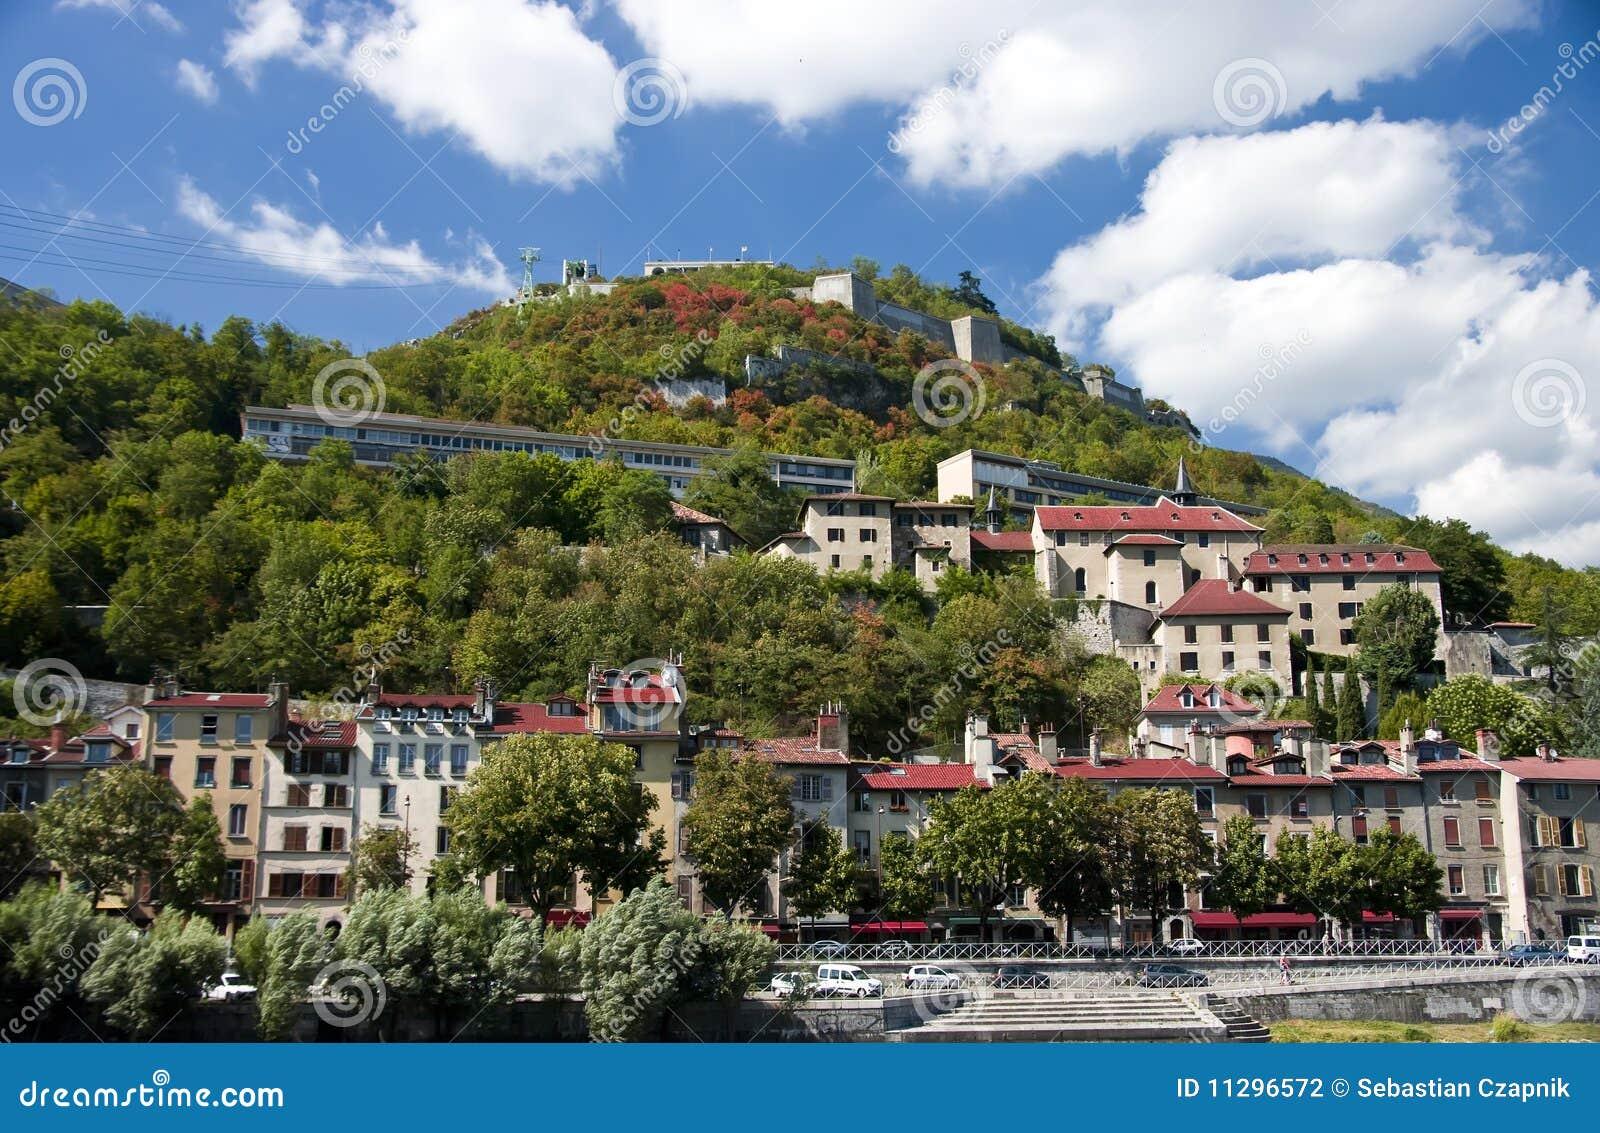 grenoble bastille stock photo image of roofs french 11296572. Black Bedroom Furniture Sets. Home Design Ideas